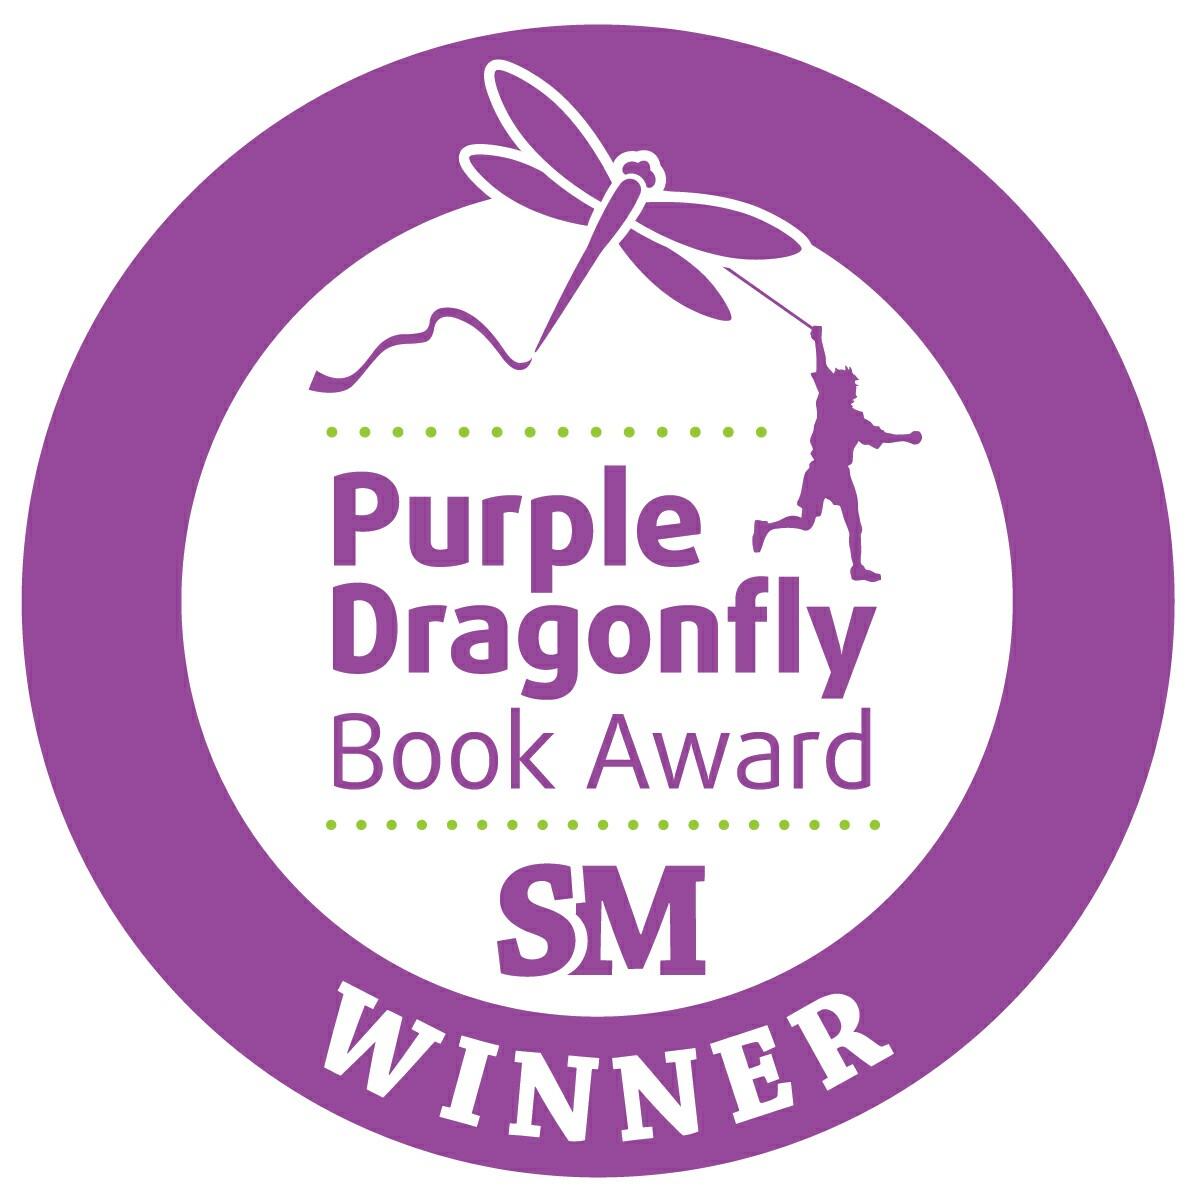 Purple Dragonfly Book Award medallion